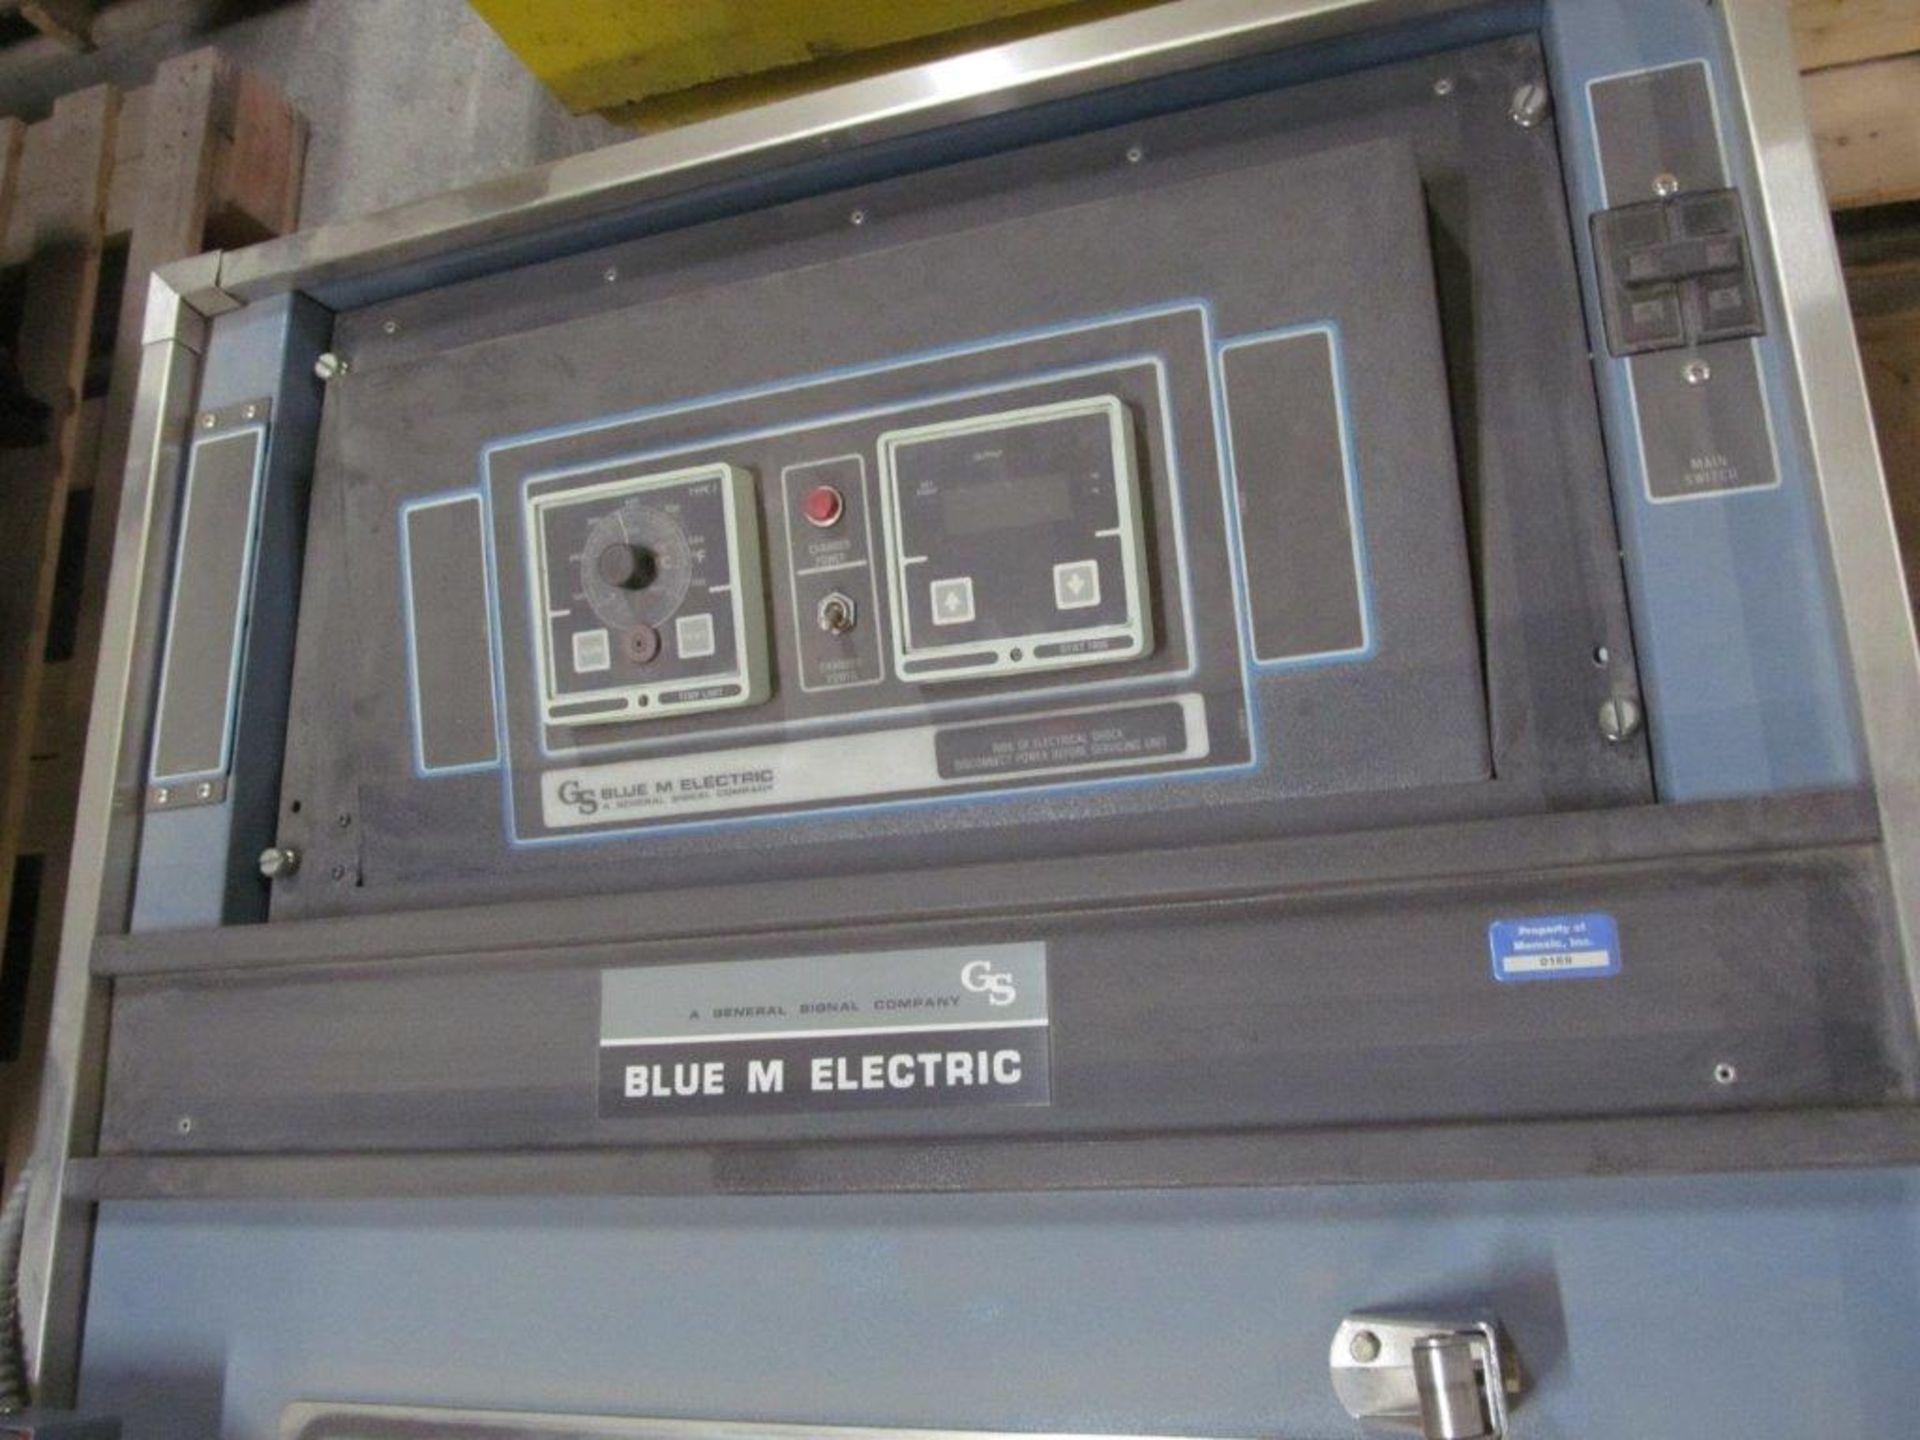 BLUE ELECTRIC 2 Chamber 100deg F. to 700deg F. - LOCATION - HAWKESBURY, ONTARIO - Image 4 of 8